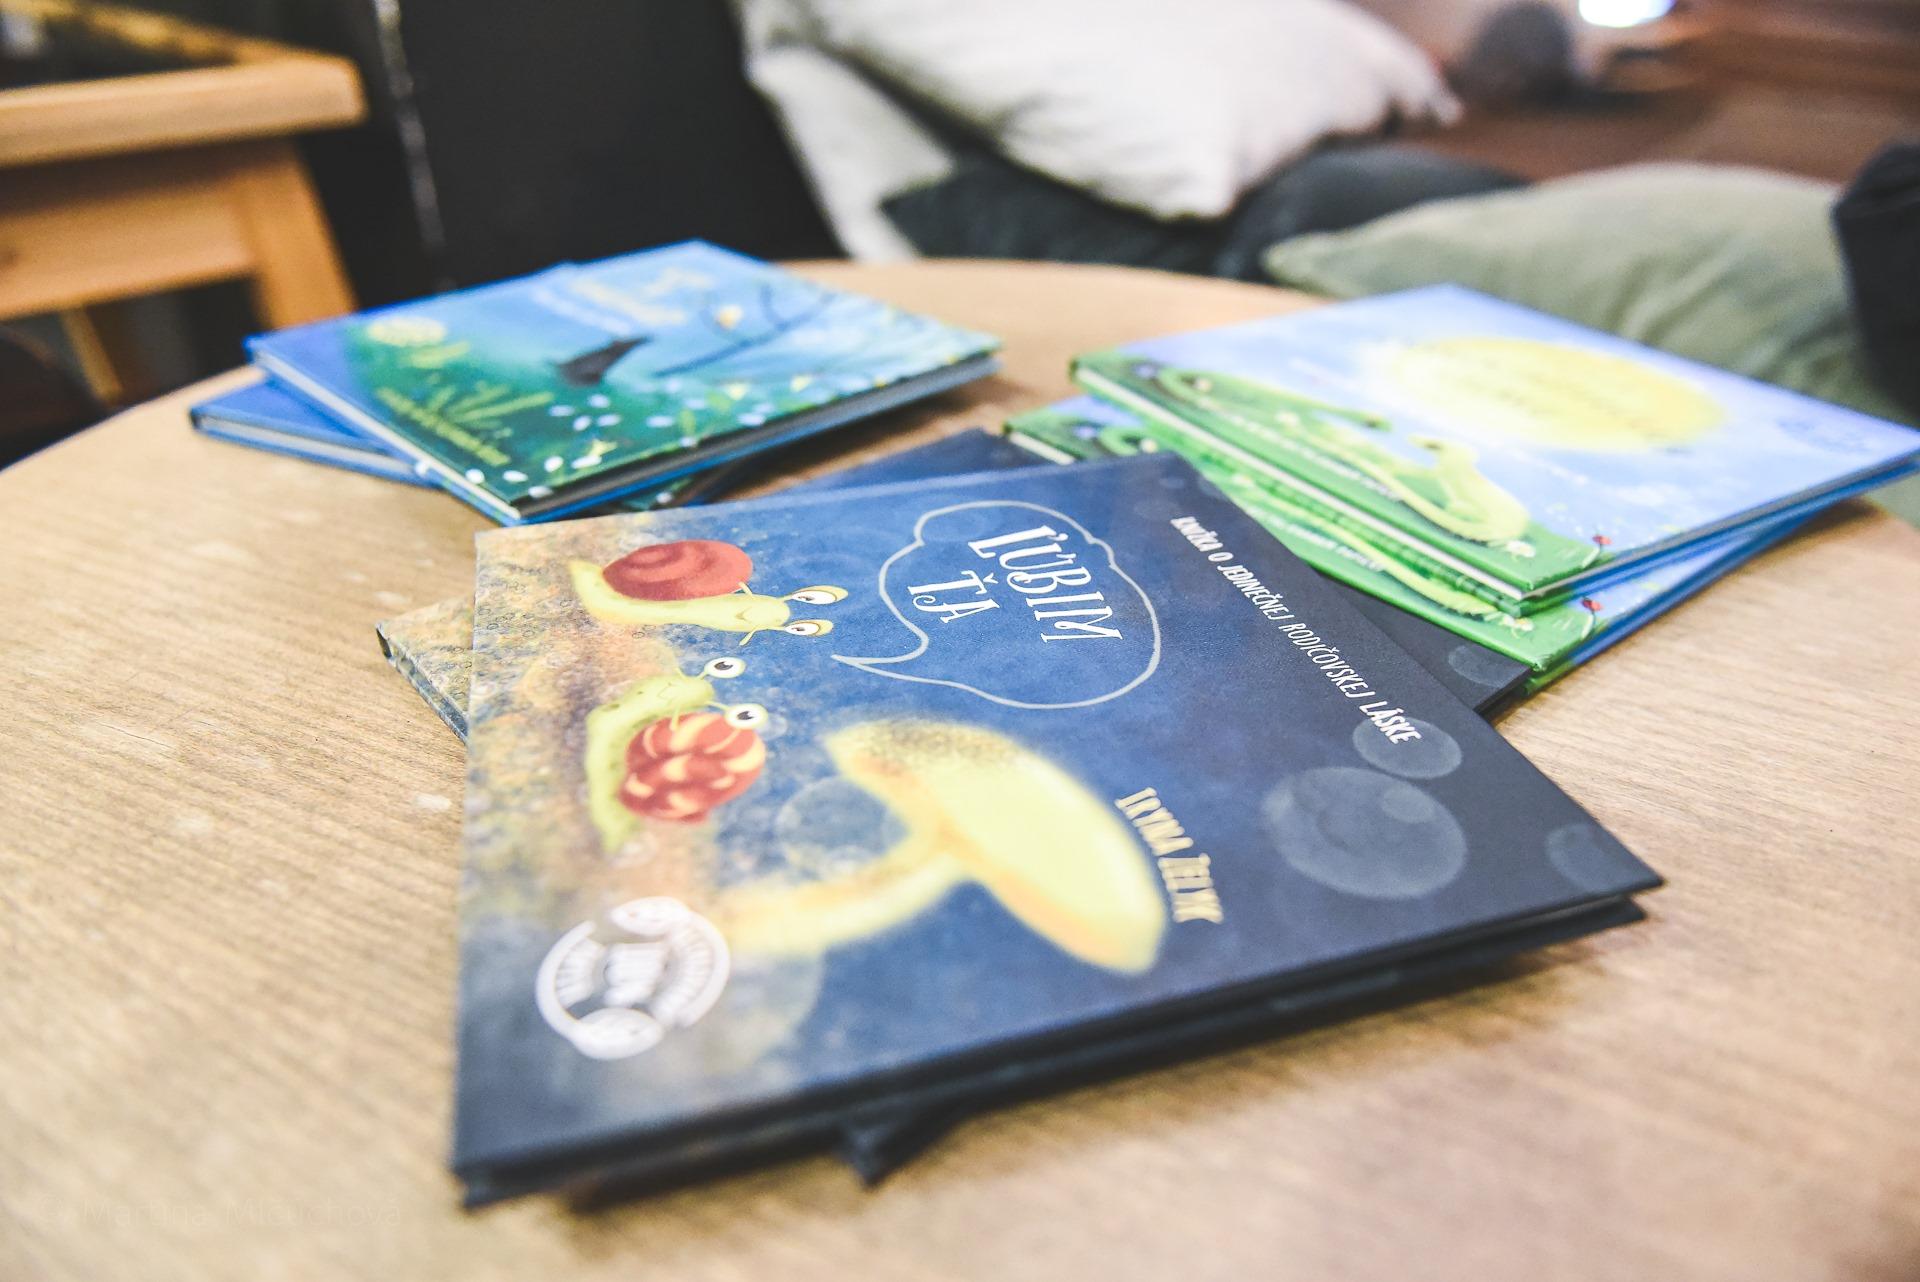 Knihy spisovateľky Iryny Zelyk / Foto: archív IZ